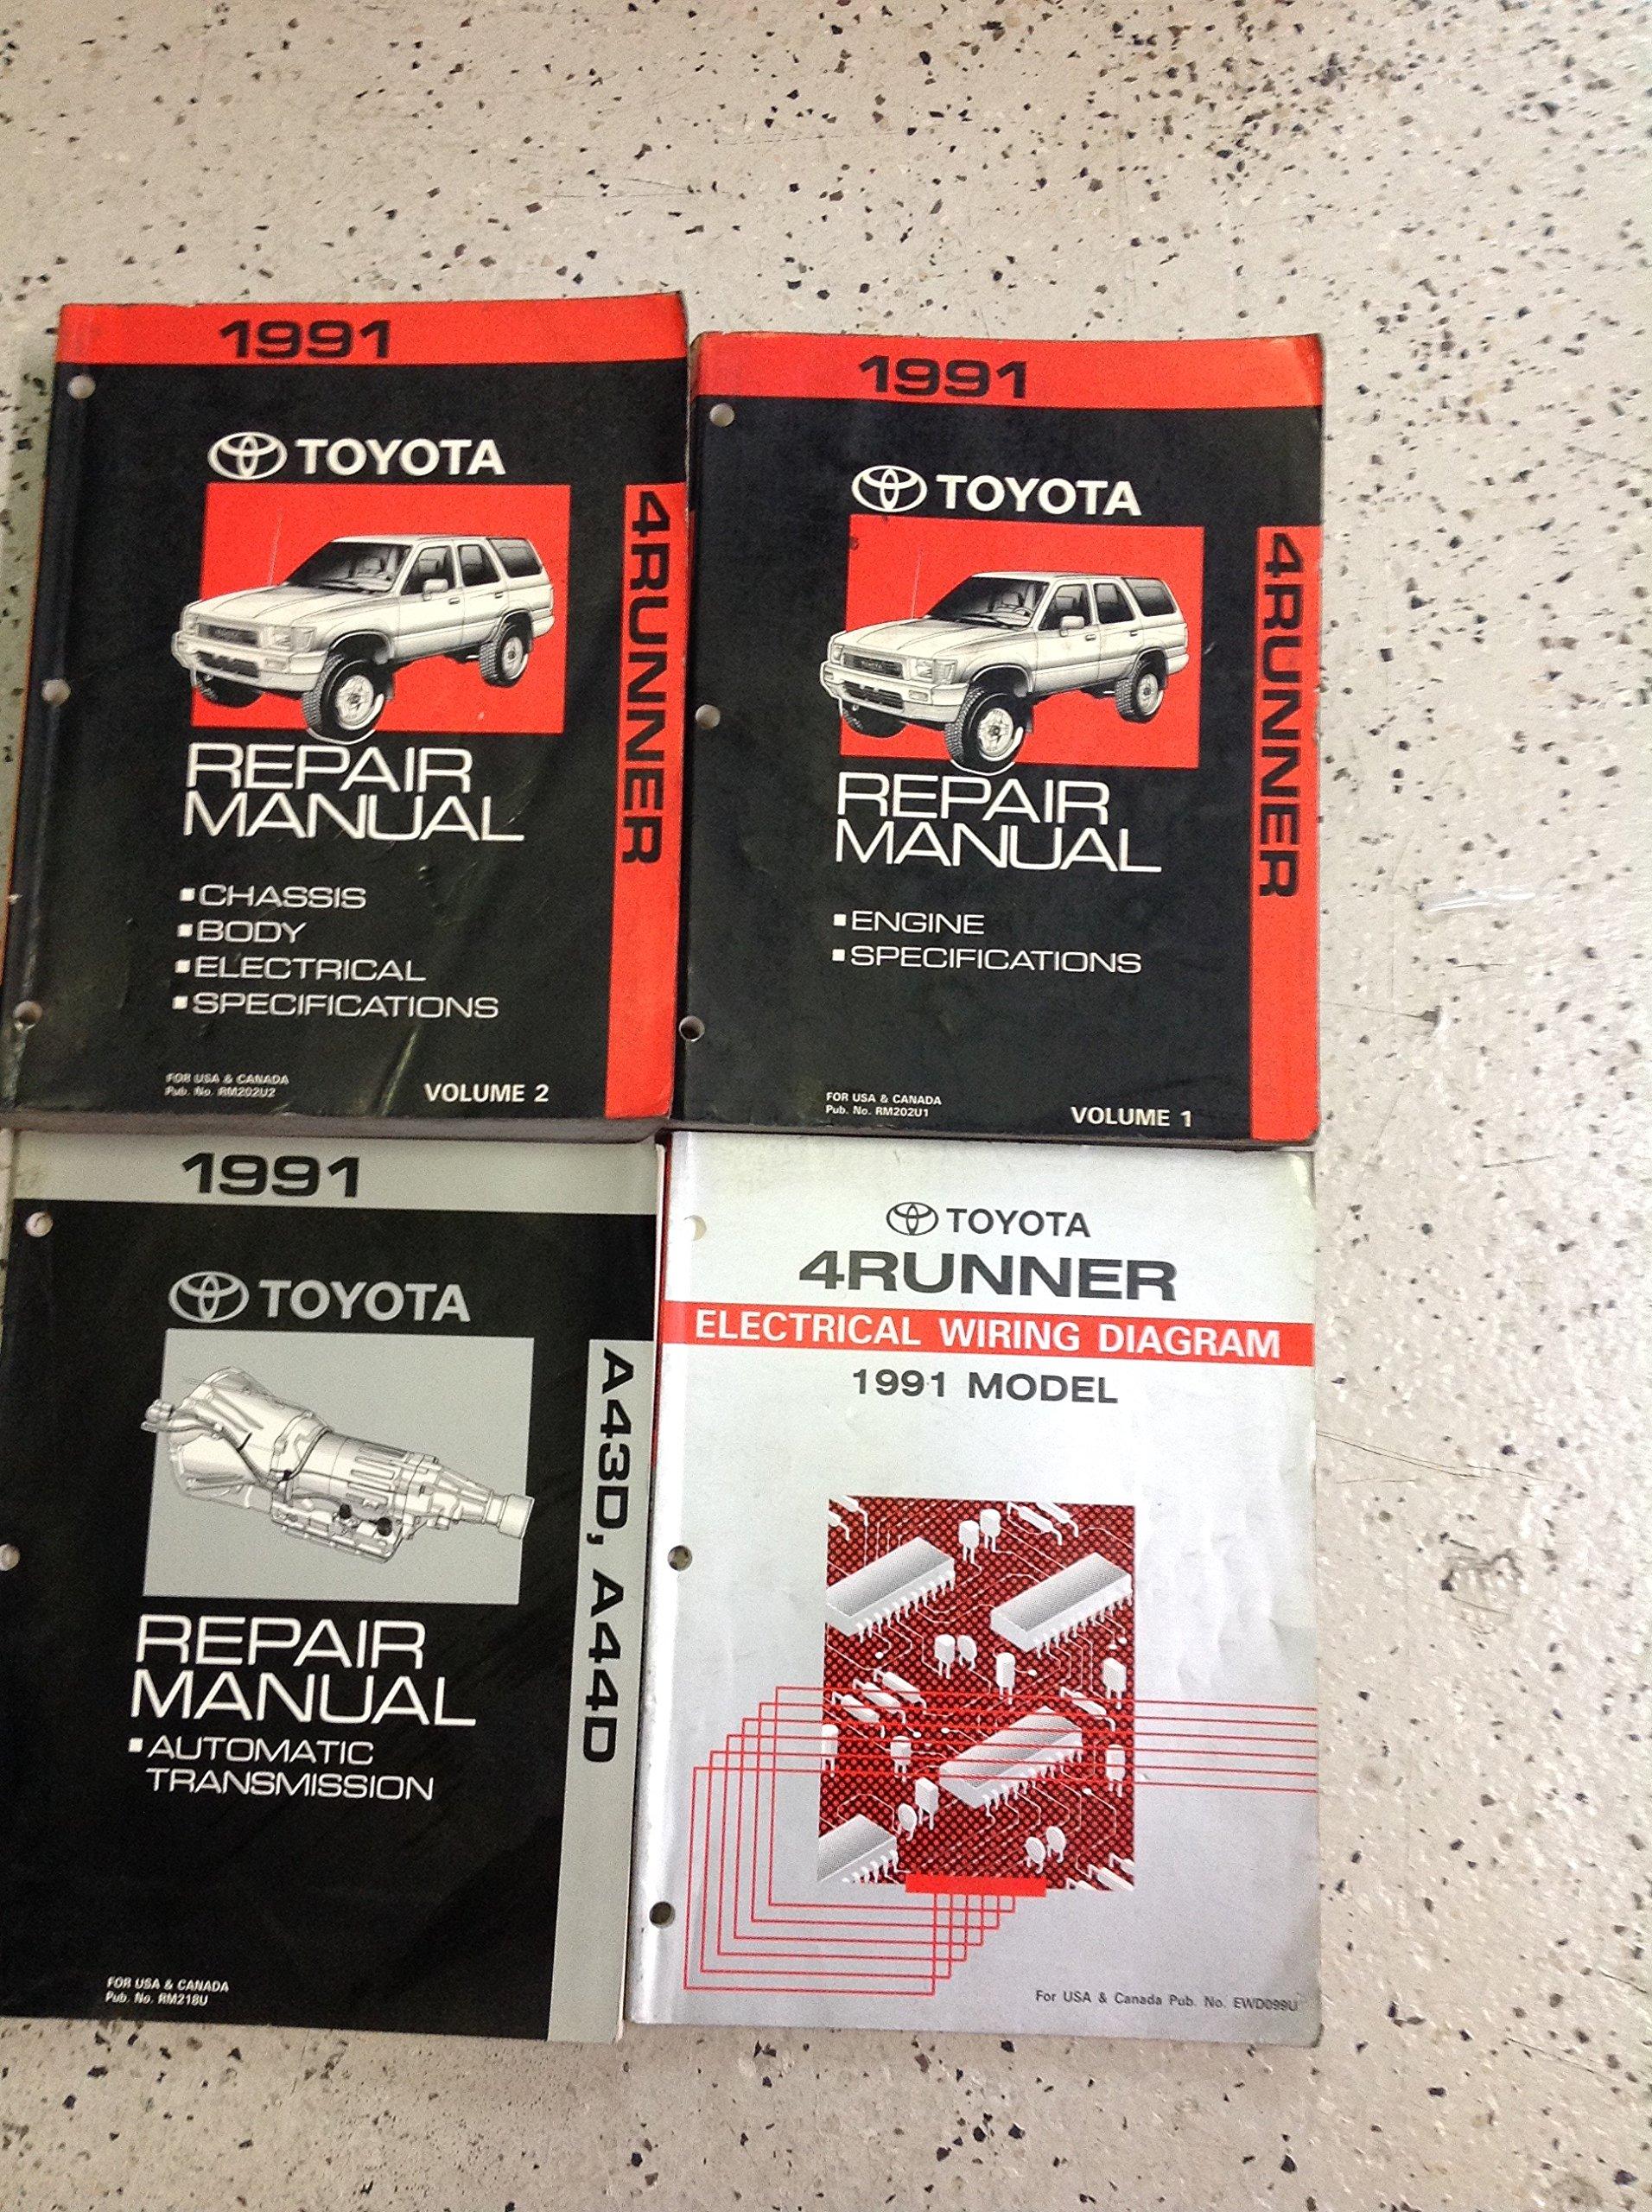 1991 TOYOTA 4RUNNER Service Shop Repair Manual Set OEM W EWD ... on 91 chrysler new yorker diagram, 91 honda civic diagram, 91 vw cabriolet diagram,